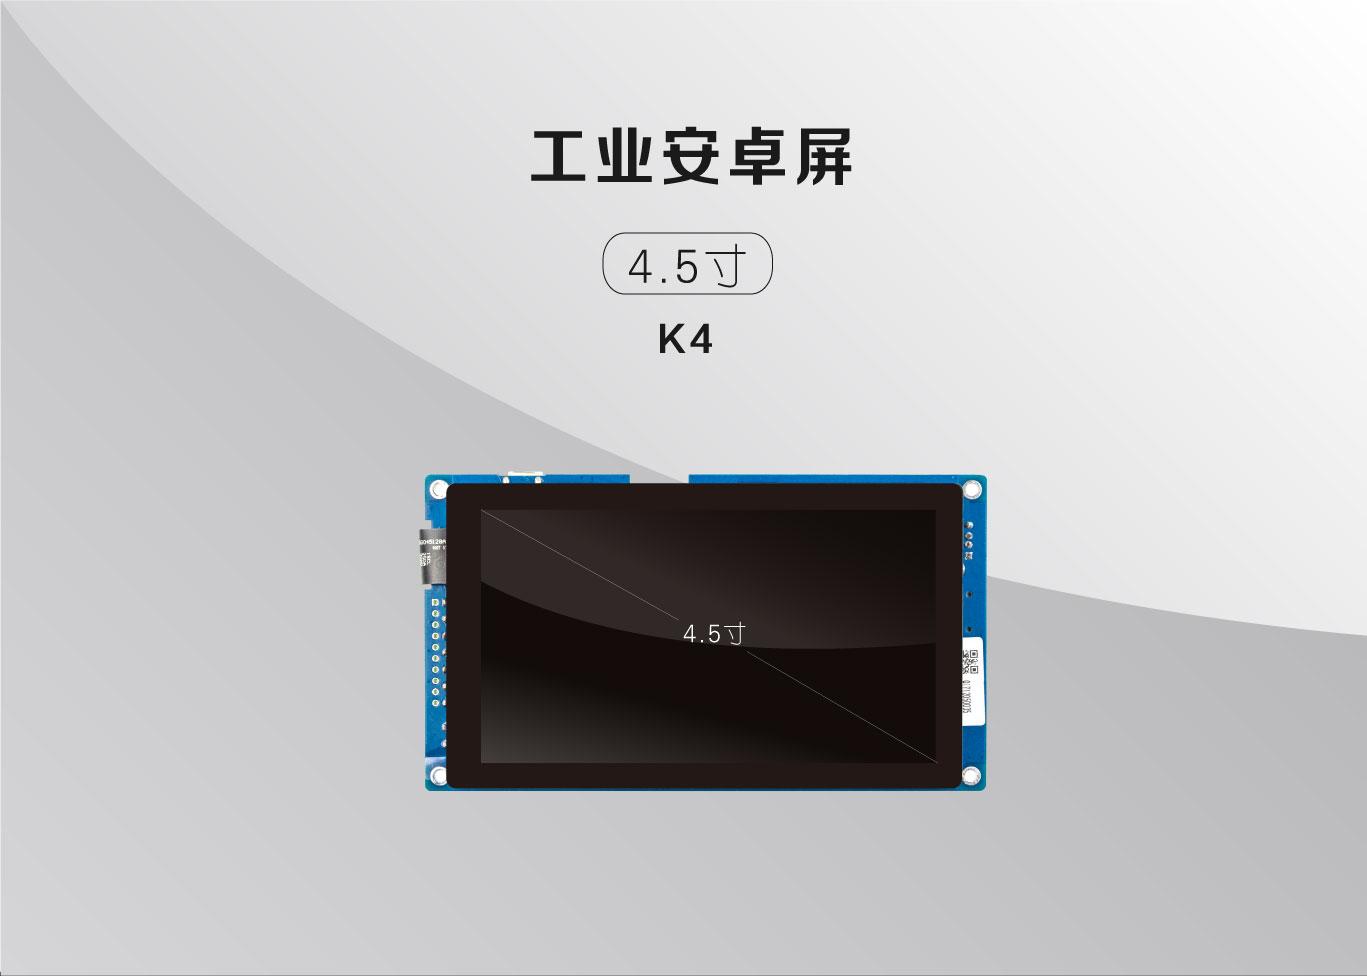 K4-01_01.jpg